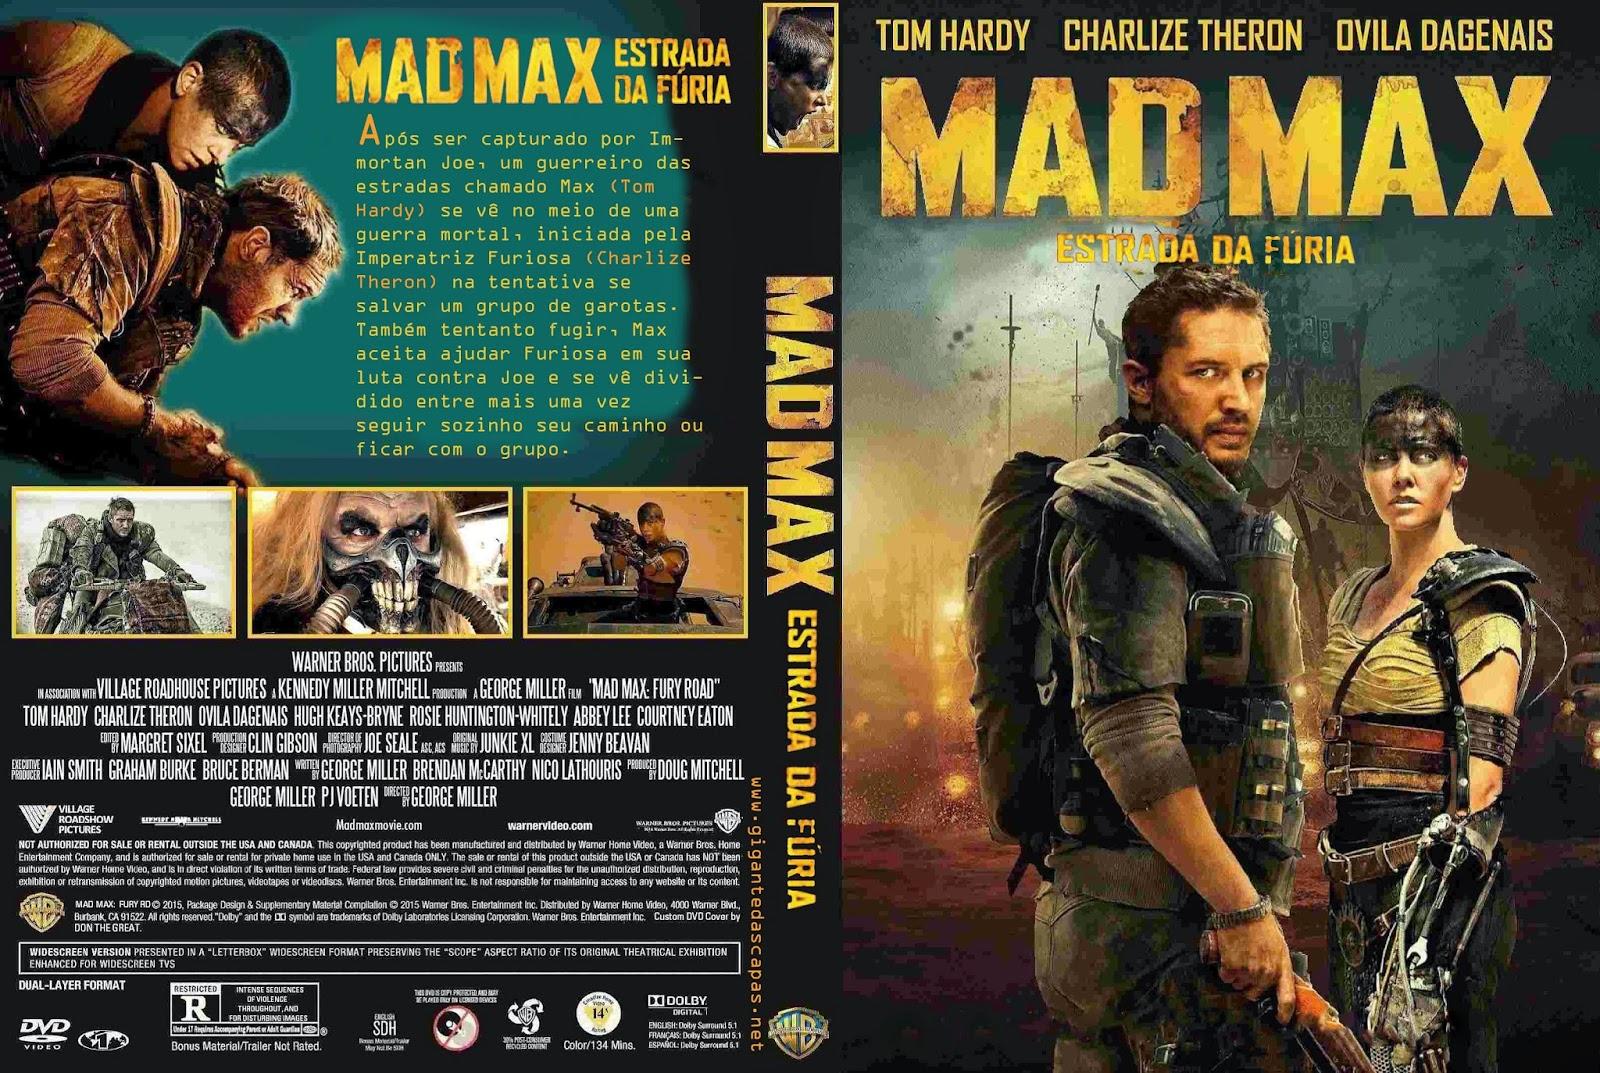 Mad Max Estrada da Fúria HDRip XviD Dual Áudio Mad 2BMax 2BEstrada 2Bda 2BF 25C3 25BAria